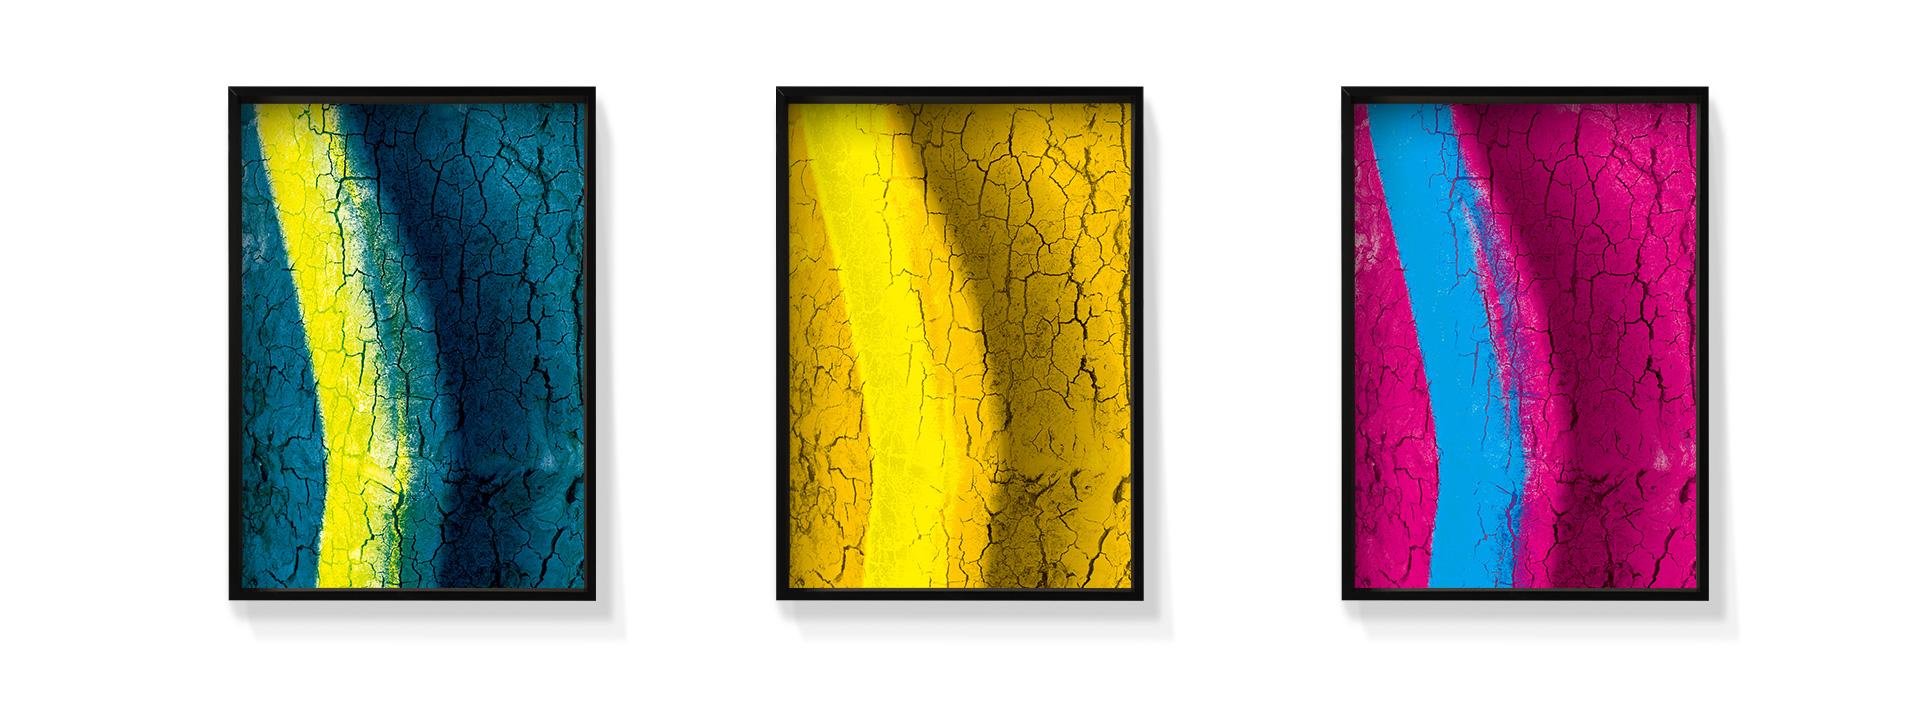 ?x-oss-process=image/format,jpg/interlace,1